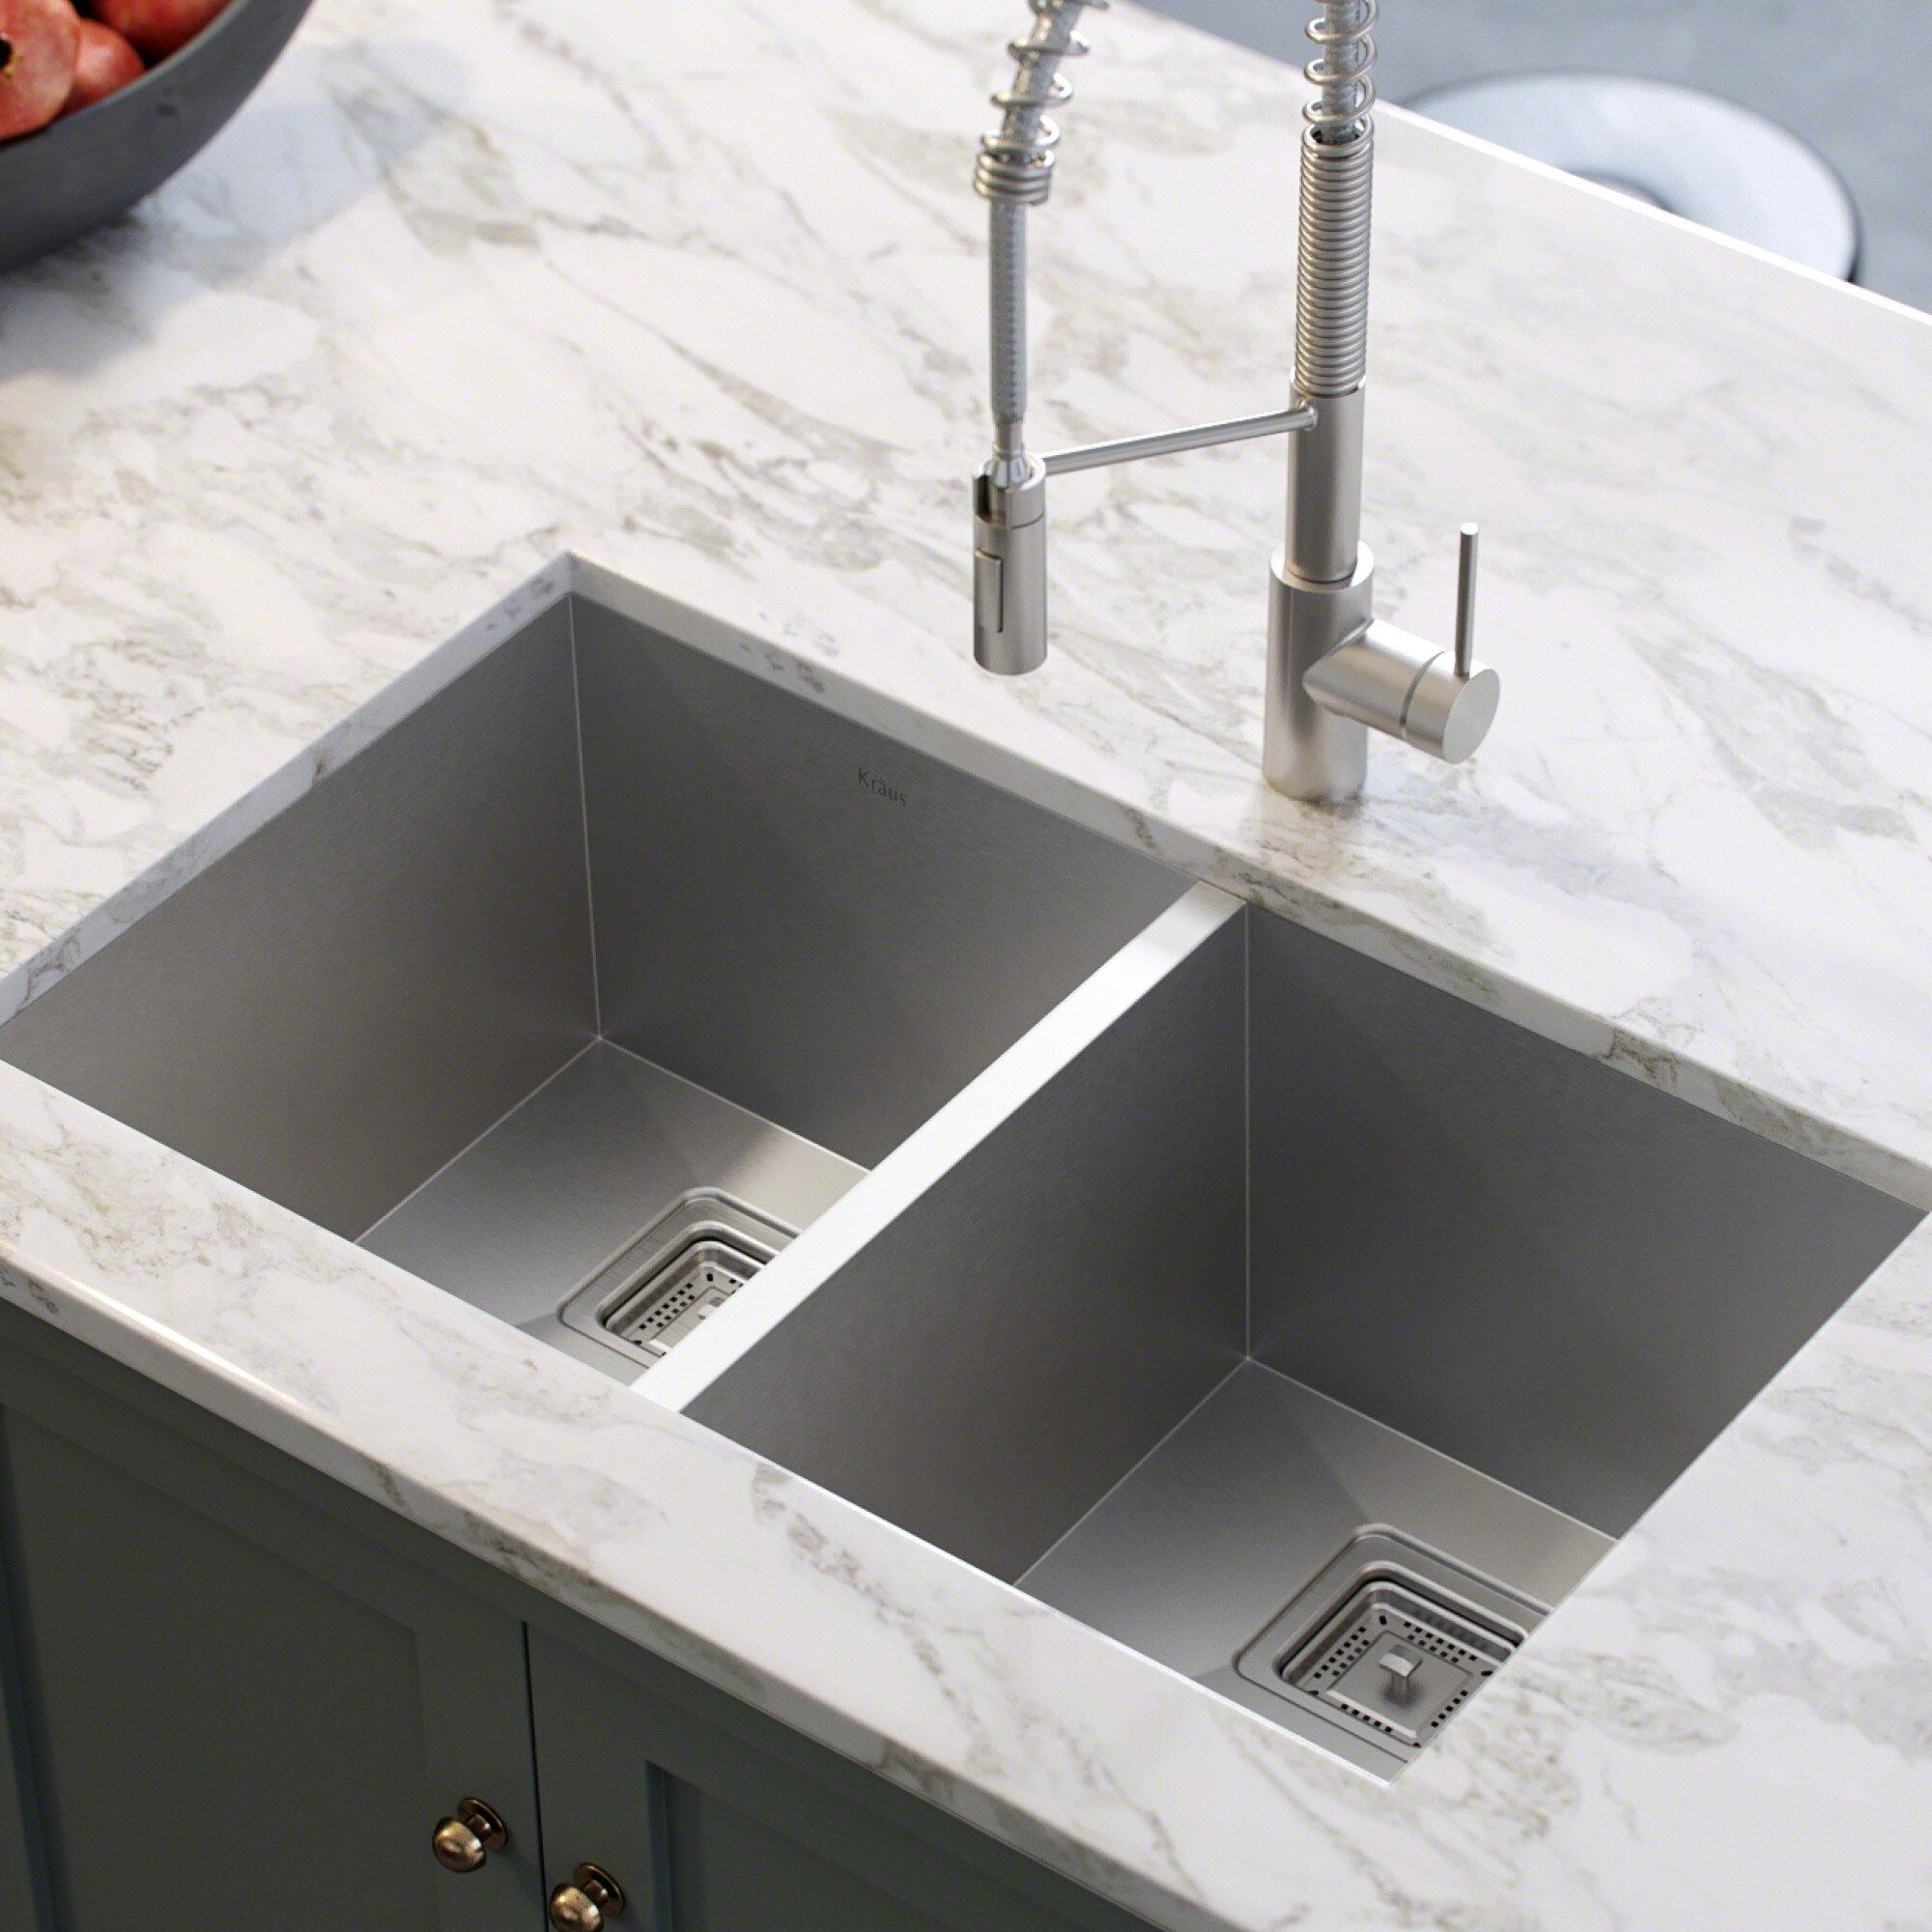 Undermount Double Kitchen Sink.Details About Kraus Pax 31 5 X 18 5 Double Basin Undermount Kitchen Sink